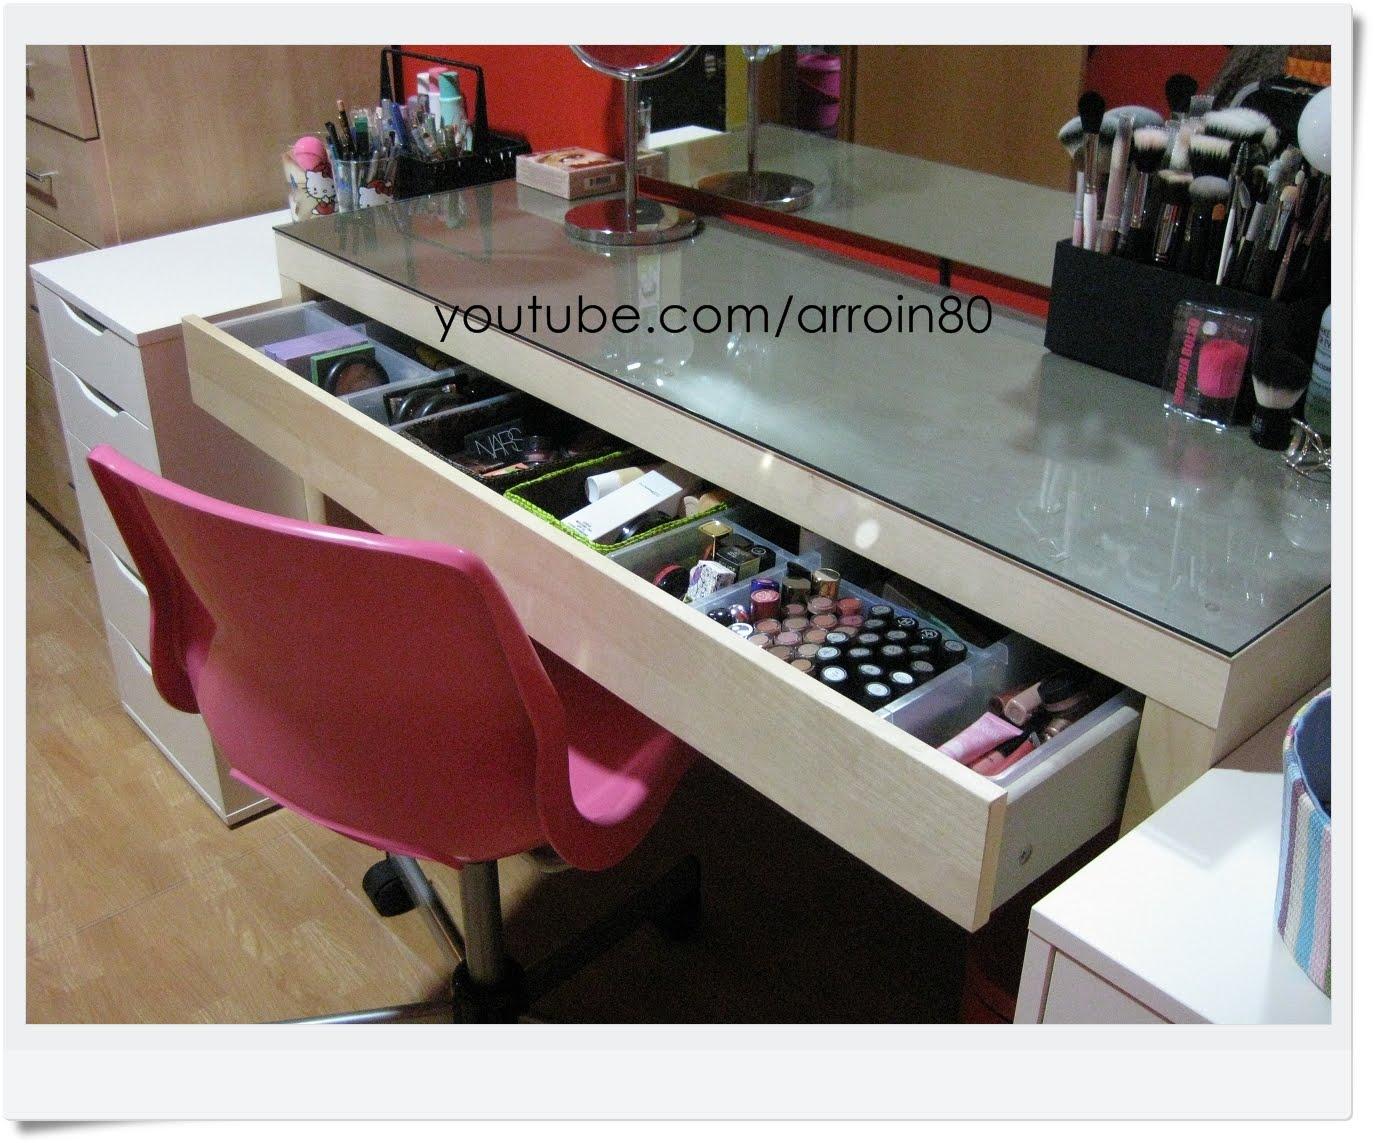 Arroin80  Blog de belleza cosmtica y maquillaje Oh IKEA